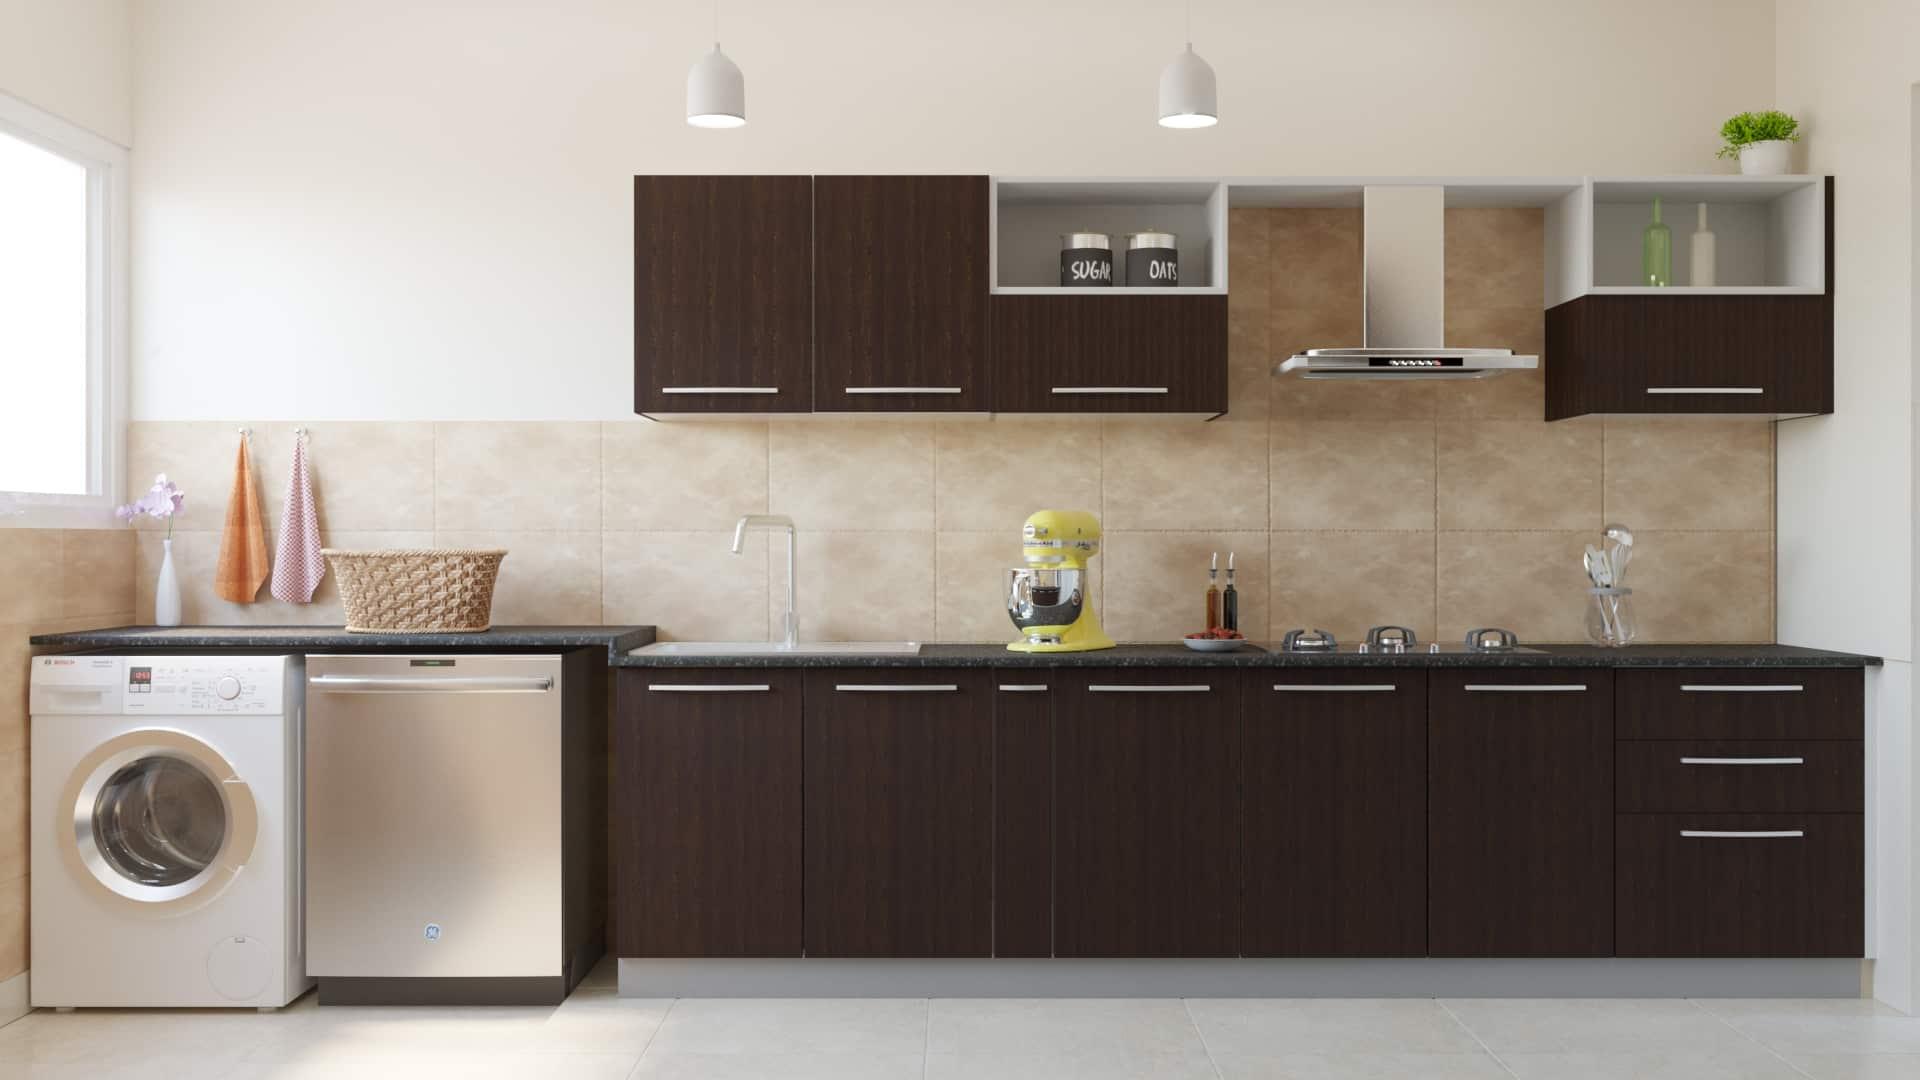 Parallel Modular Kitchen Designs India Homelane